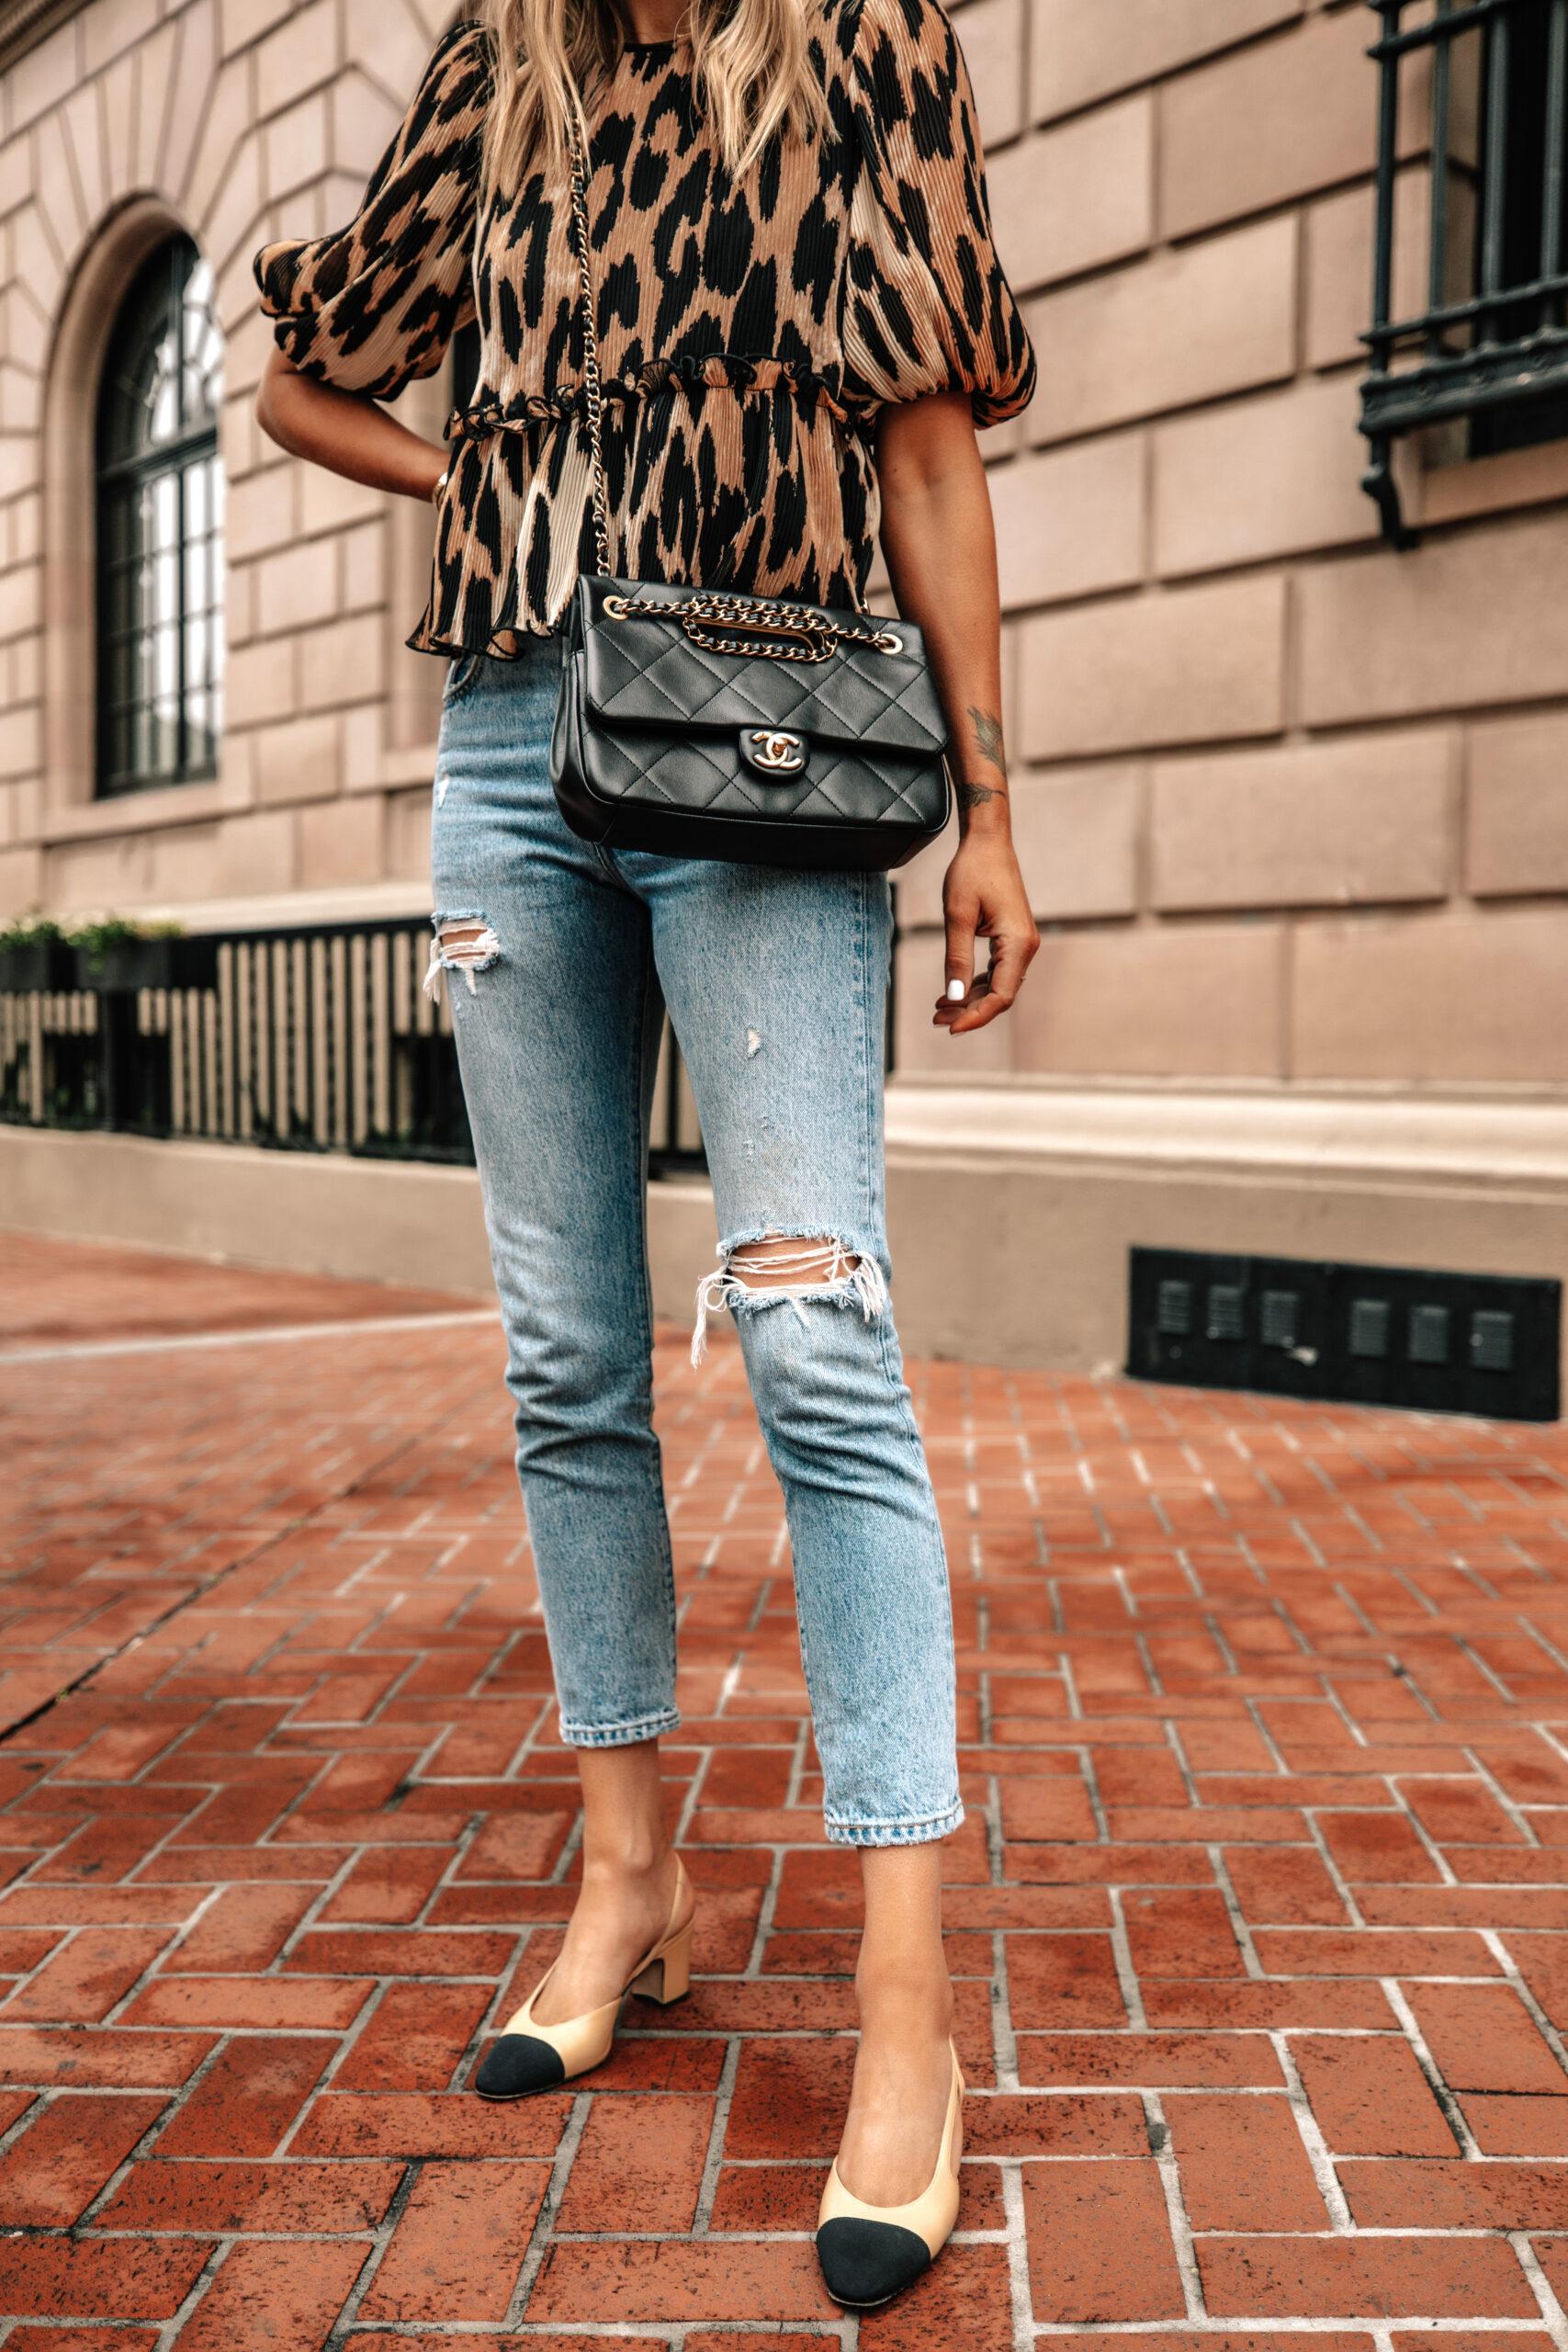 Fashion Jackson Wearing Ganni Leopard Top Levis Ripped Jeans Chanel Slingbacks